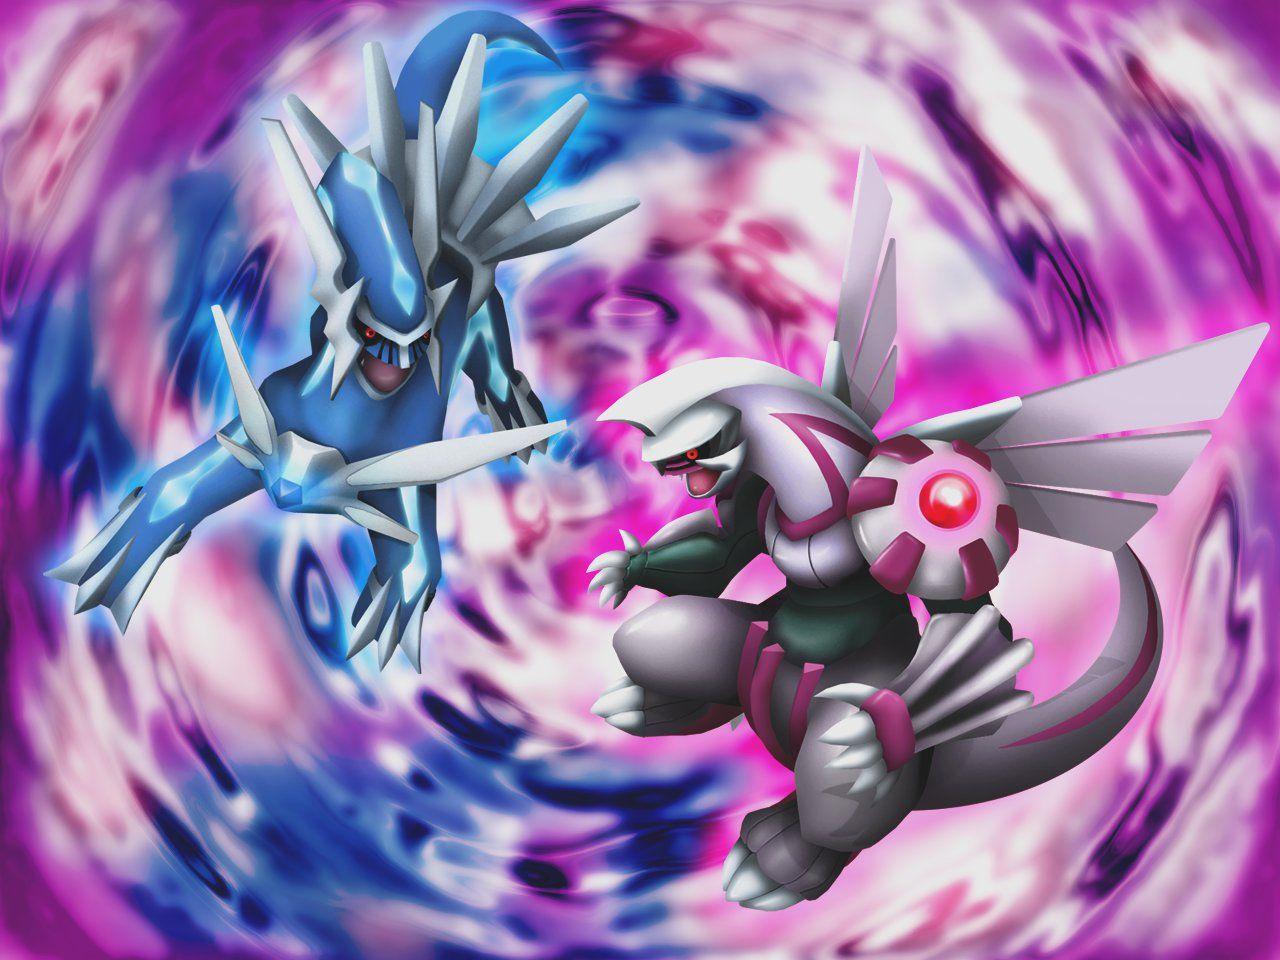 Download Pokemon 3d Wallpaper Hd Backgrounds Download Itlcat